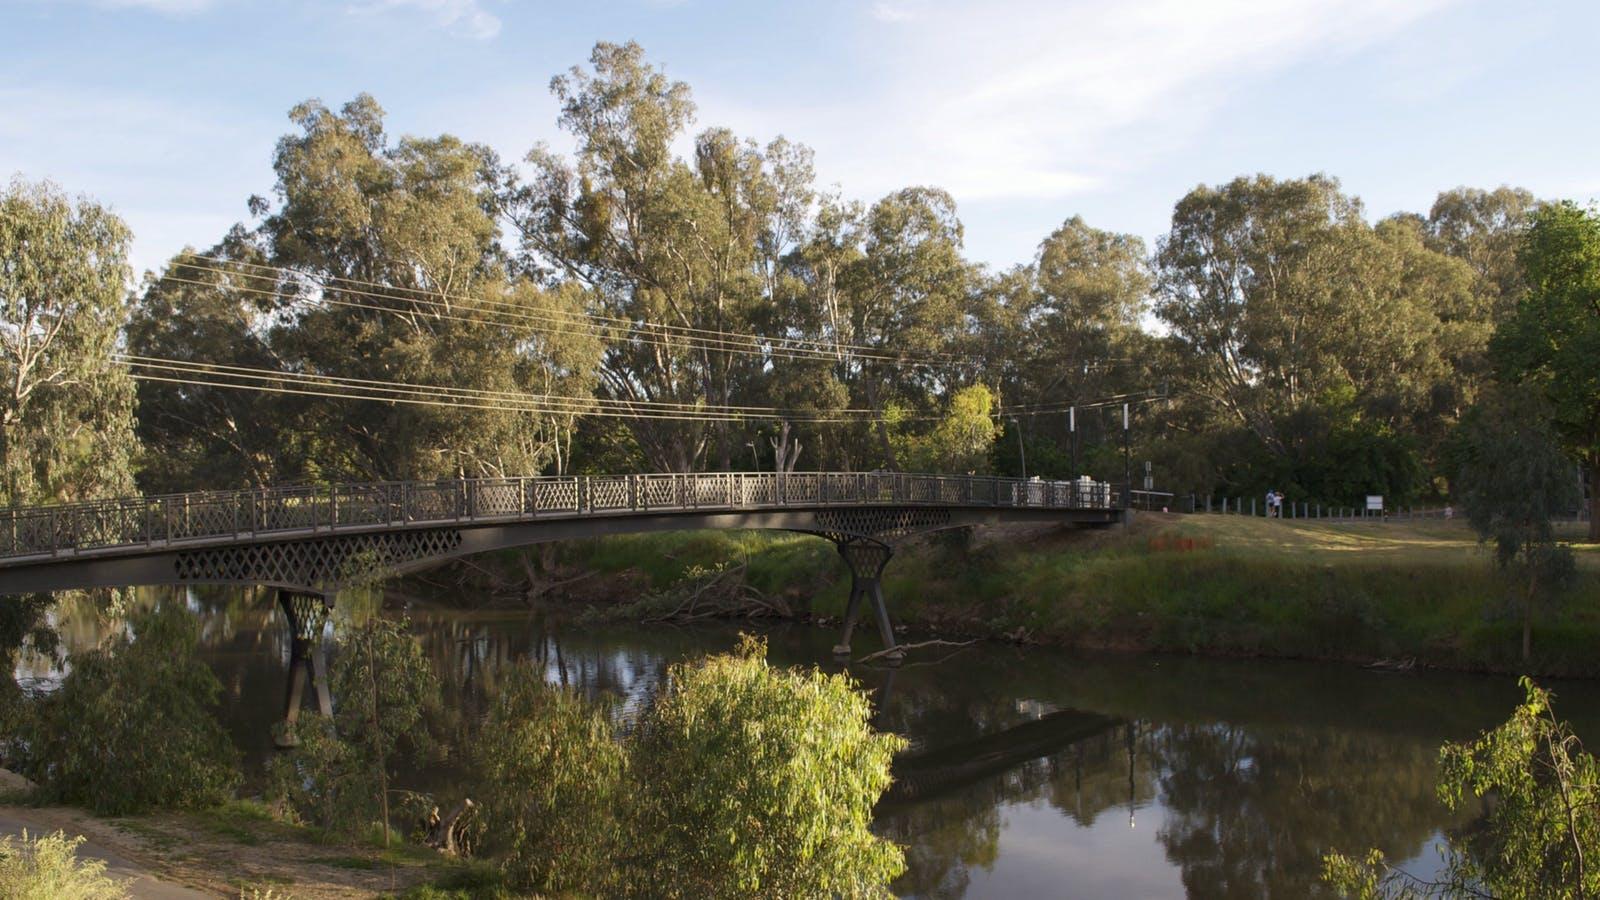 2 minute walk over footbridge to town